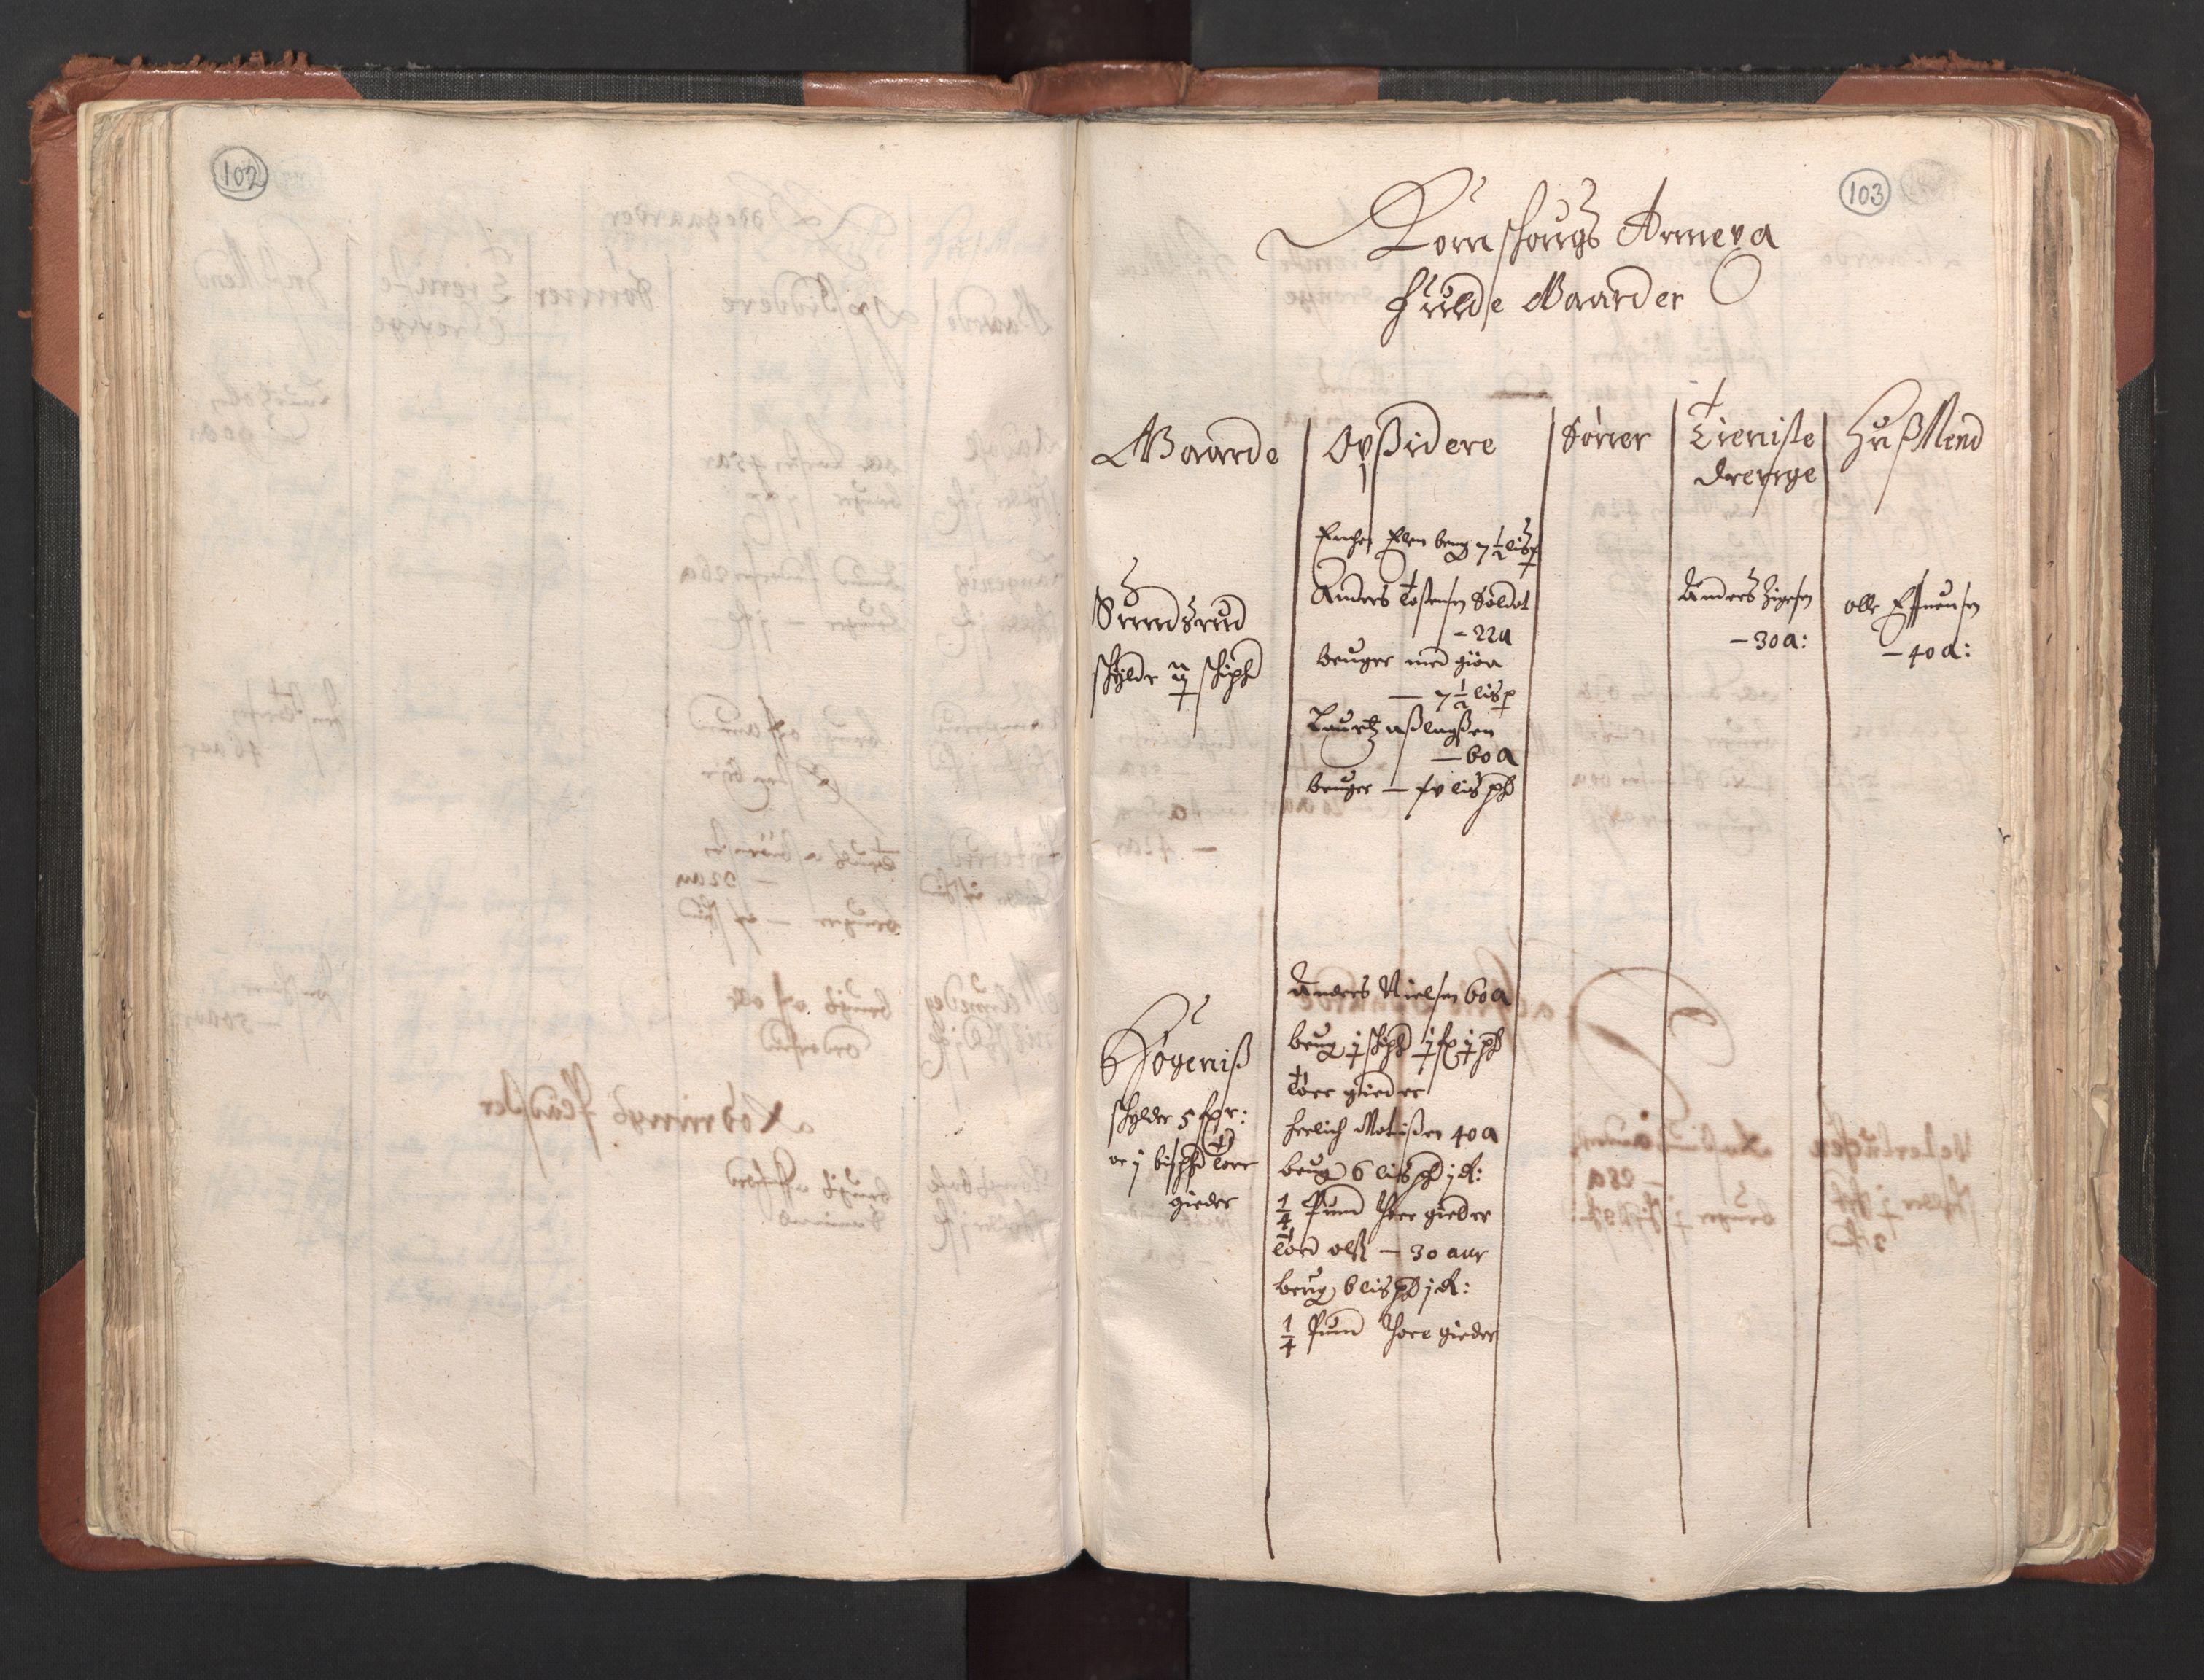 RA, Fogdenes og sorenskrivernes manntall 1664-1666, nr. 1: Fogderier (len og skipreider) i nåværende Østfold fylke, 1664, s. 102-103